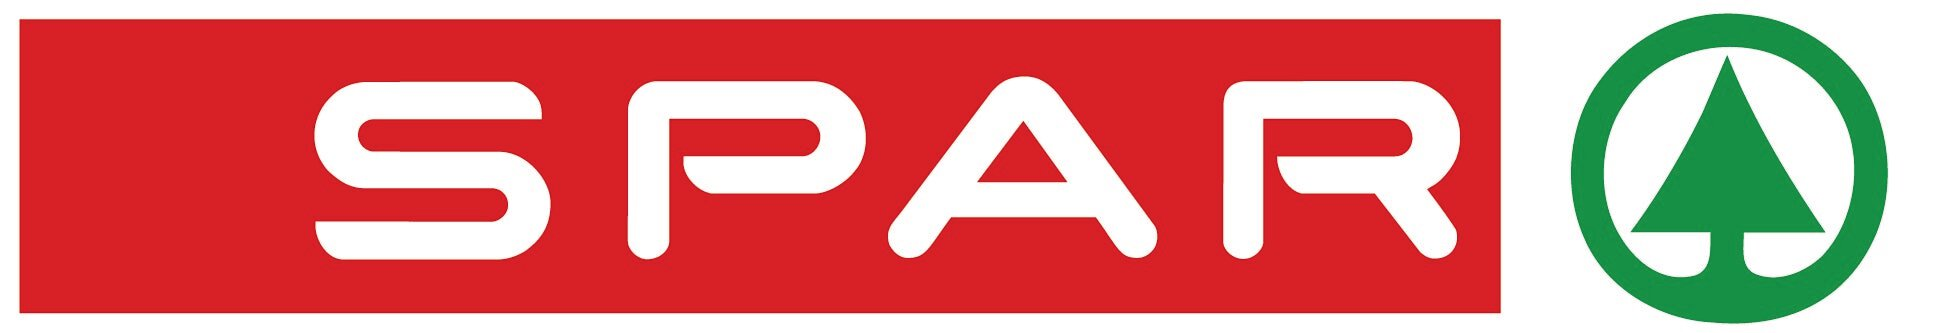 spar, czech republic logo